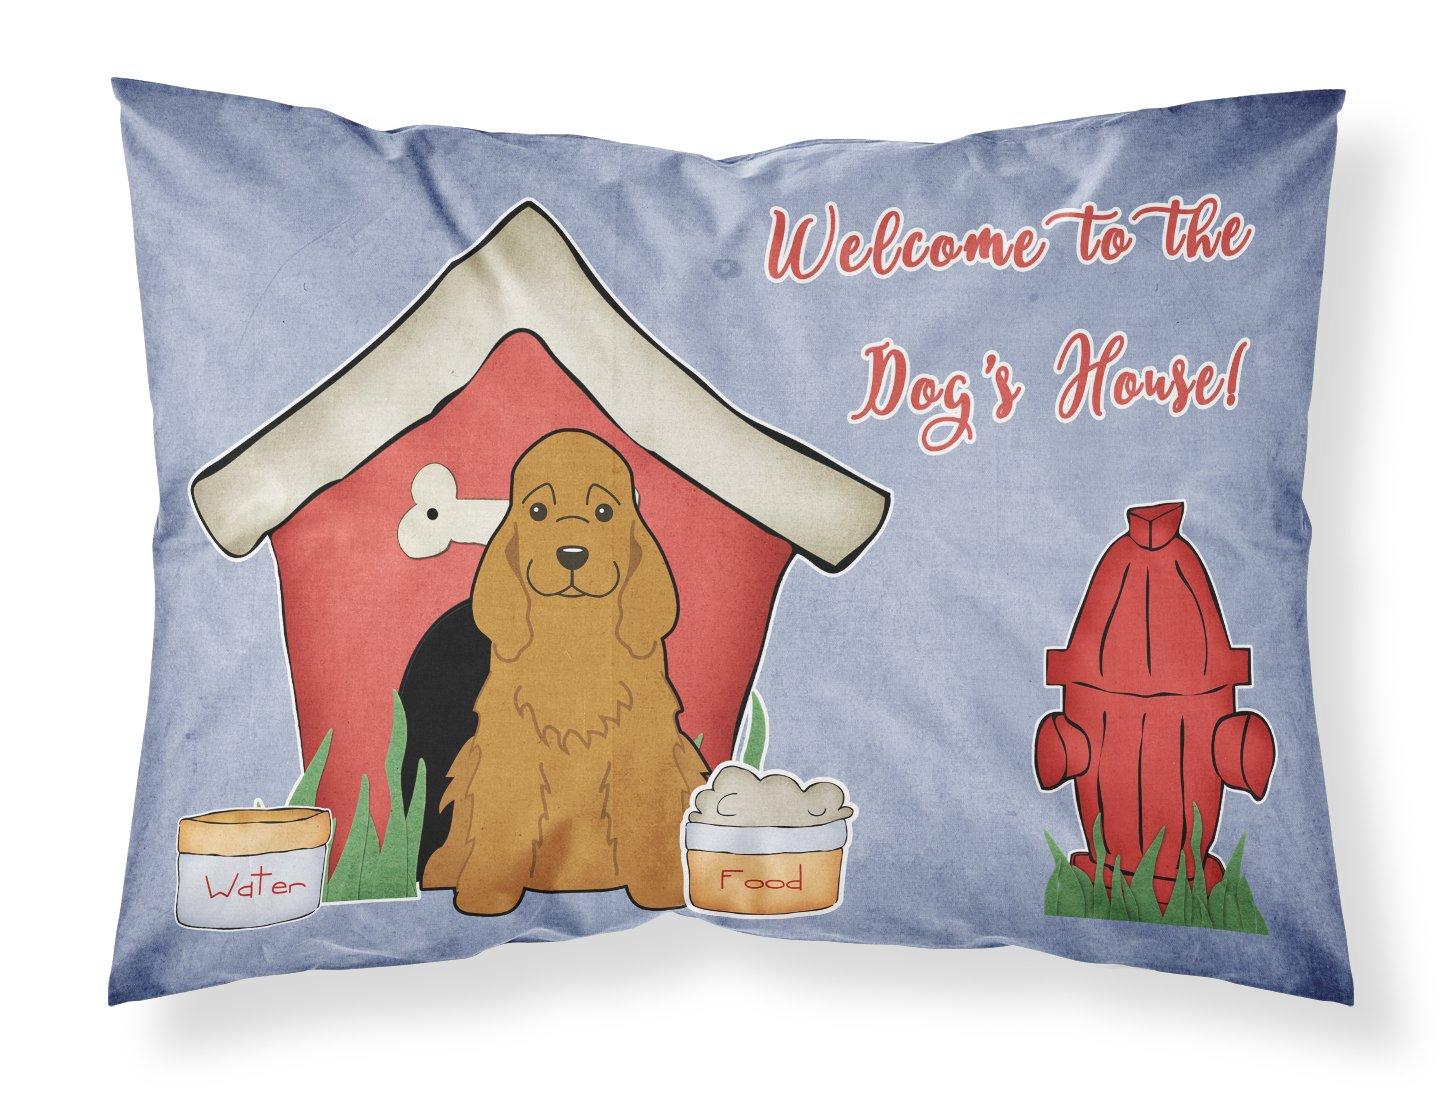 Carolines Treasures Dog House Collection Cocker Spaniel Red Fabric Standard Pillowcase BB2849PILLOWCASE Multicolor